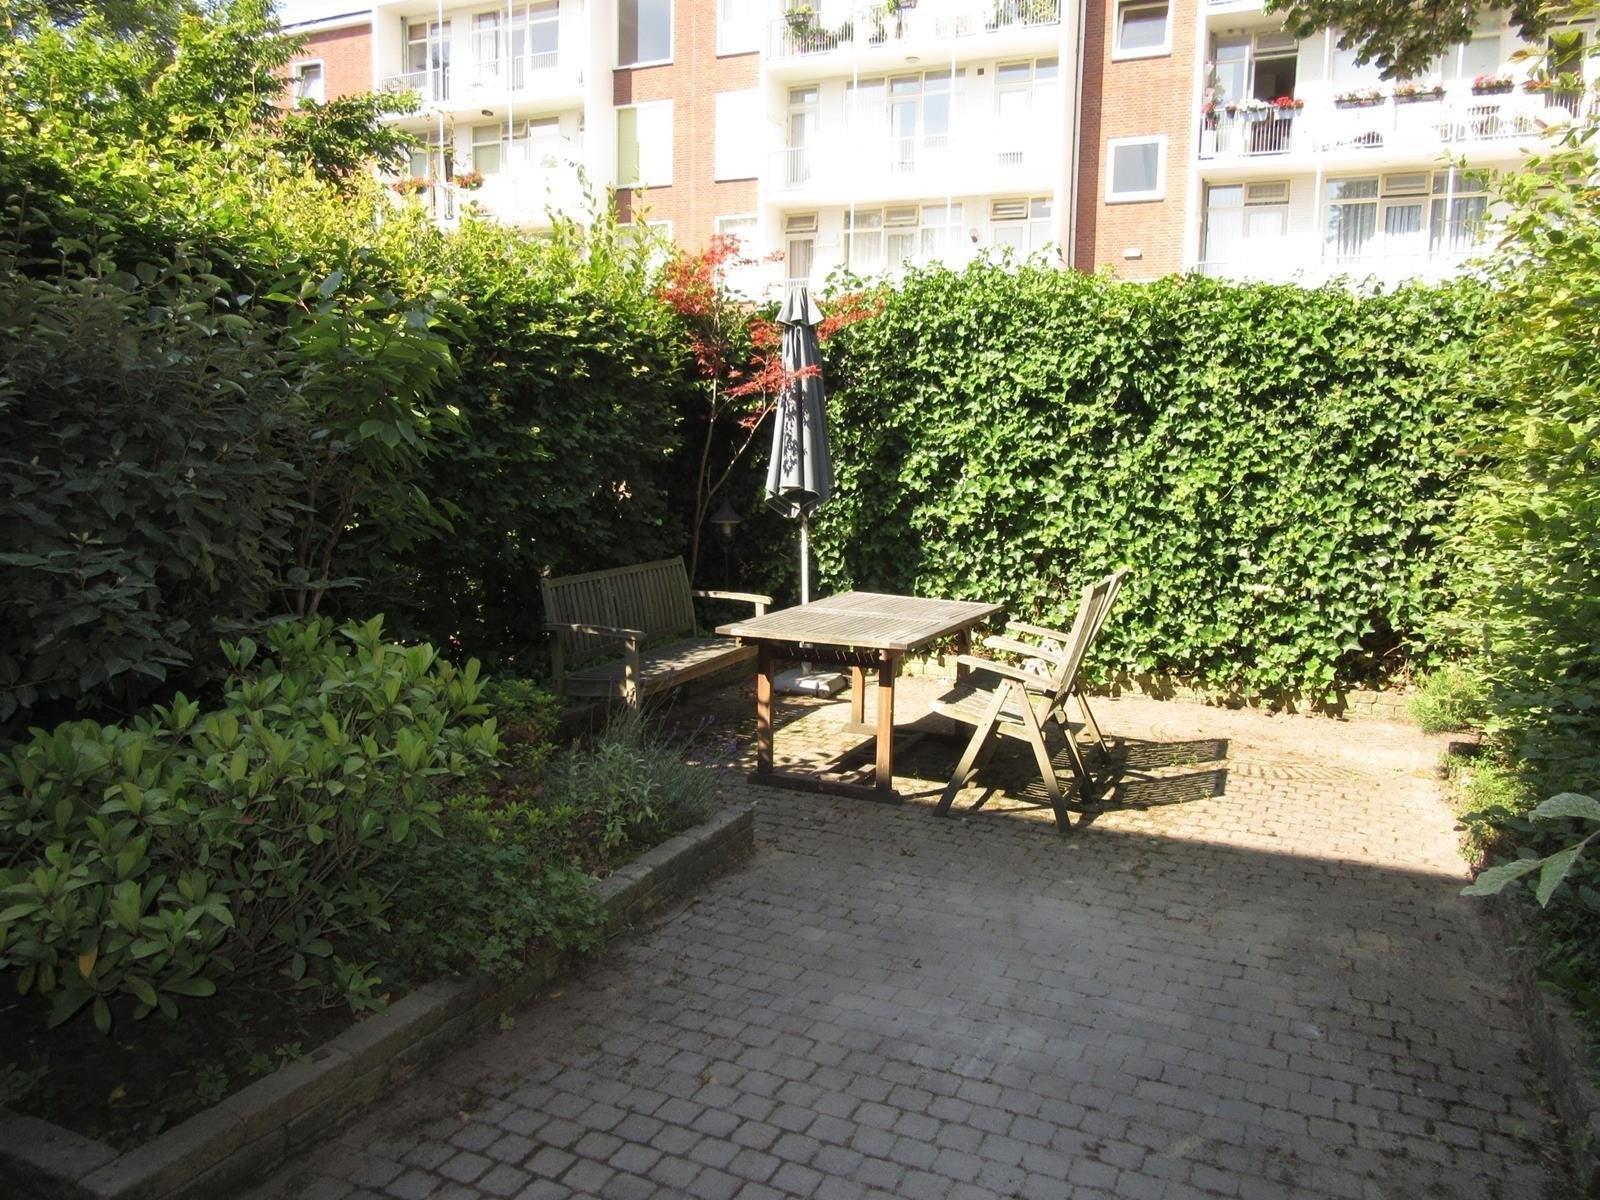 https://public.parariusoffice.nl/15/photos/huge/2612043.1501590856-543.jpg